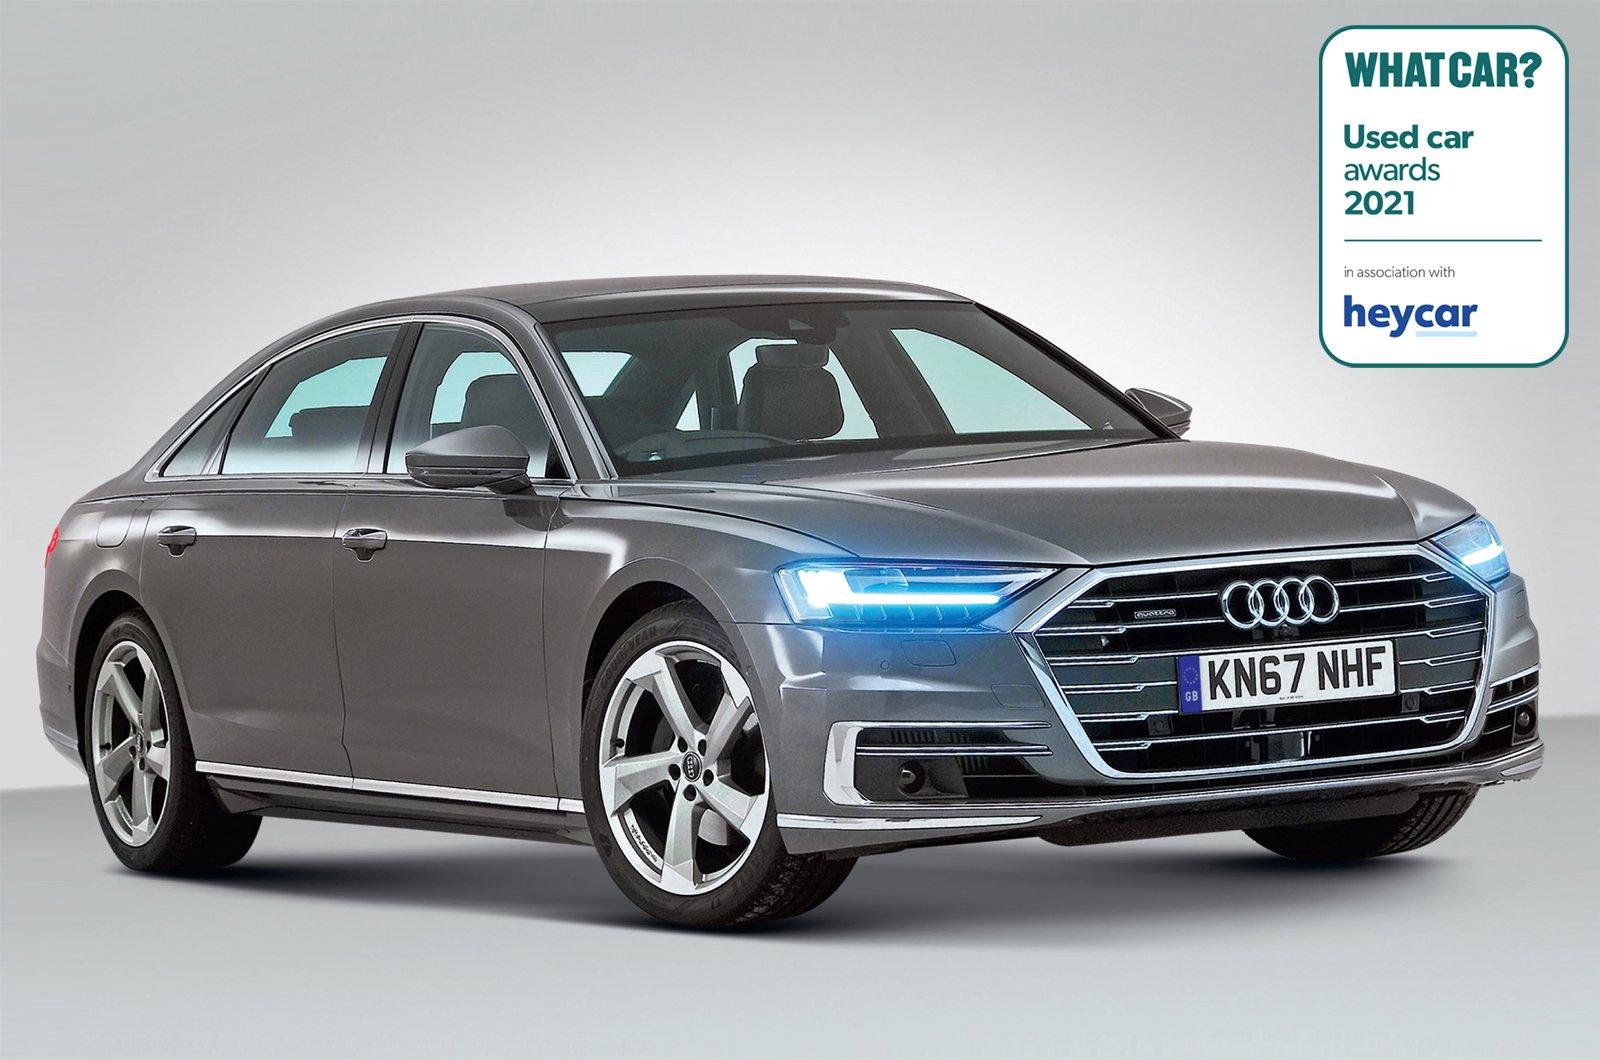 Used Car Awards 2021 - Audi A8